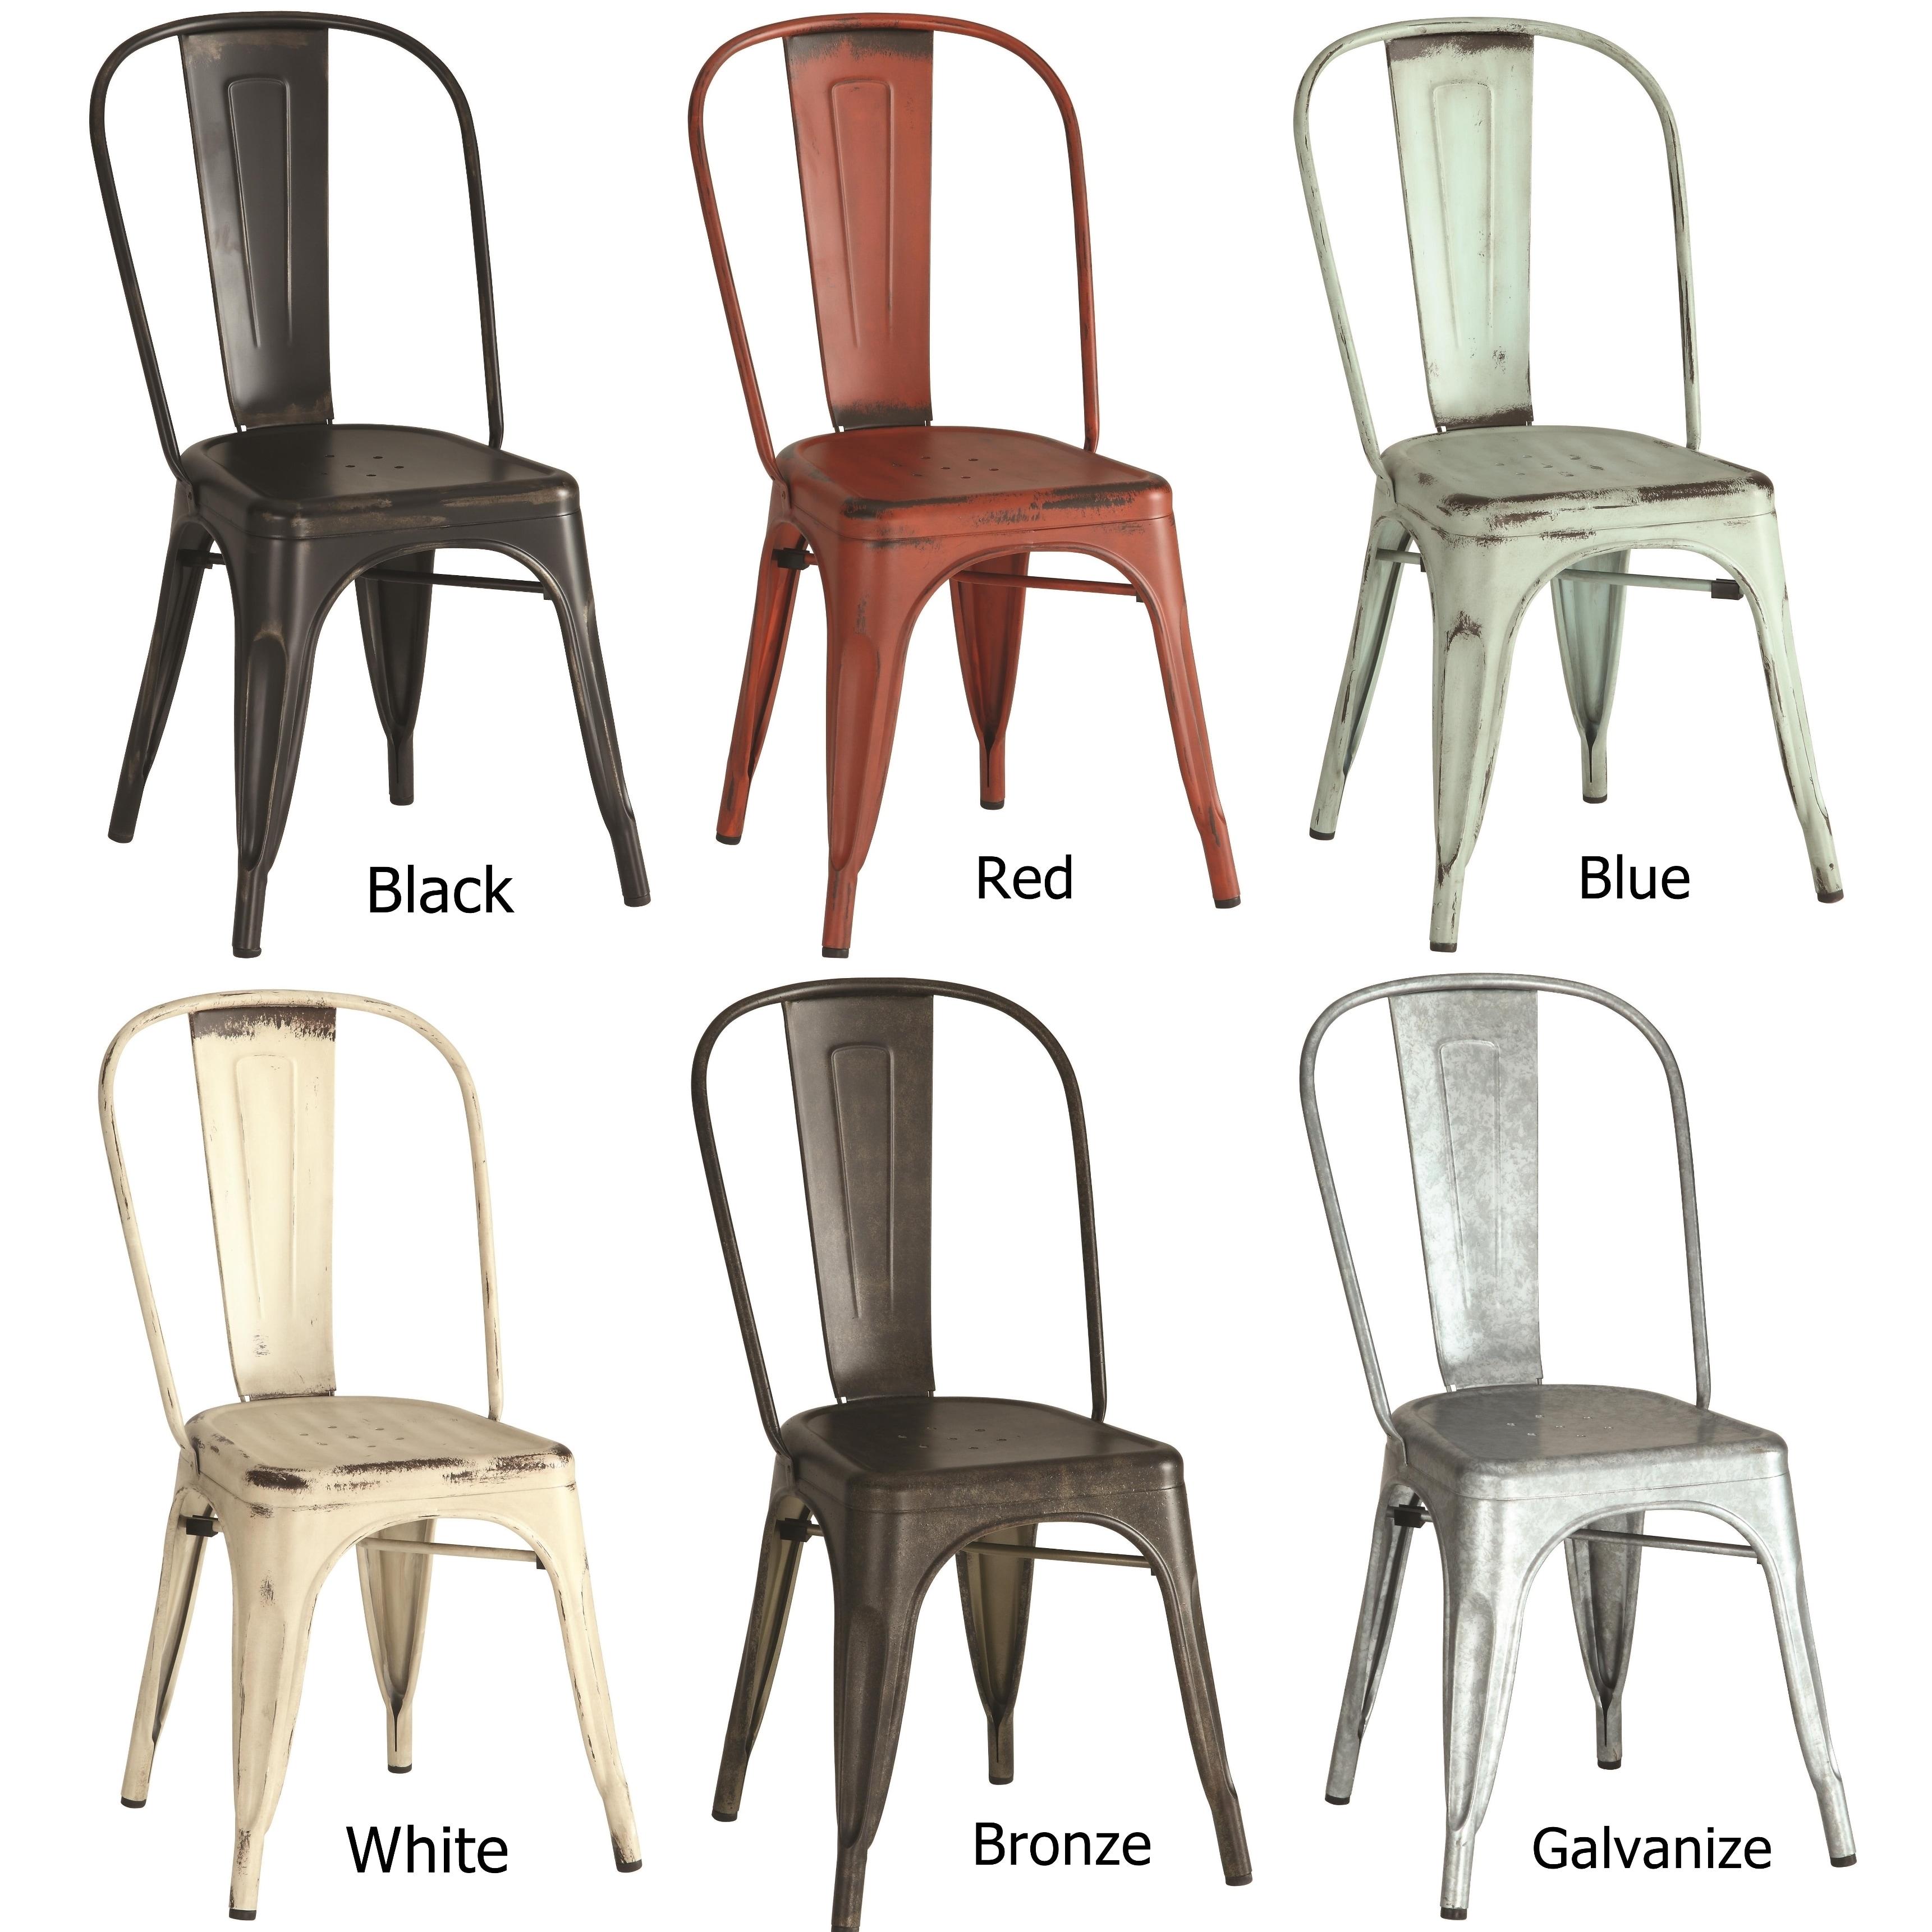 Vintage Distressed Rustic Metal Dining Chairs Set Of